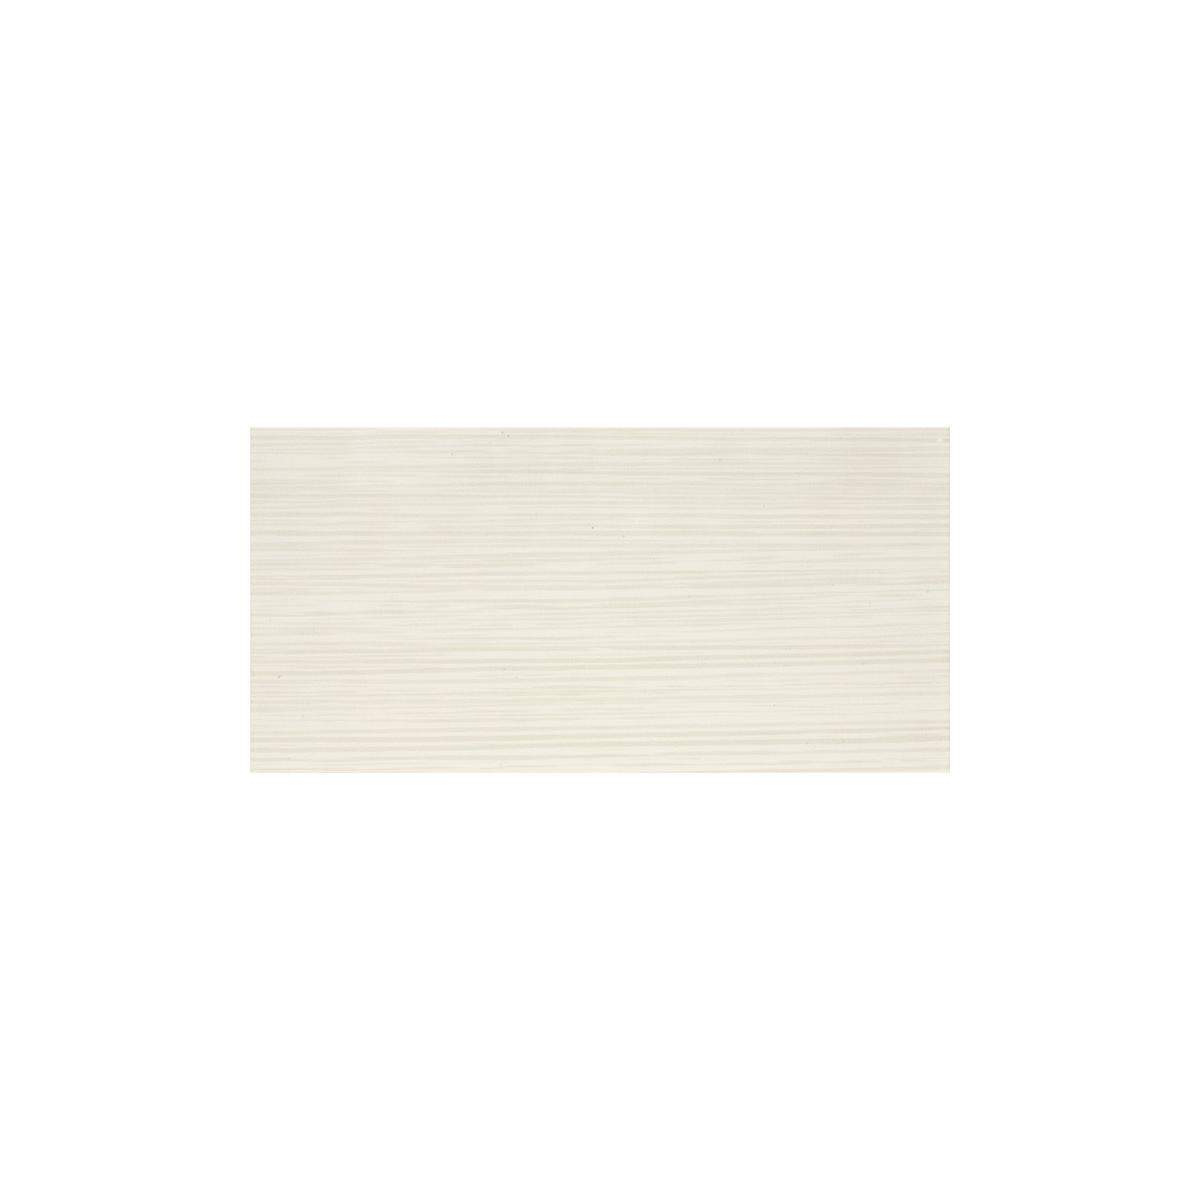 Glam Blanco (Caja de 1 m2)